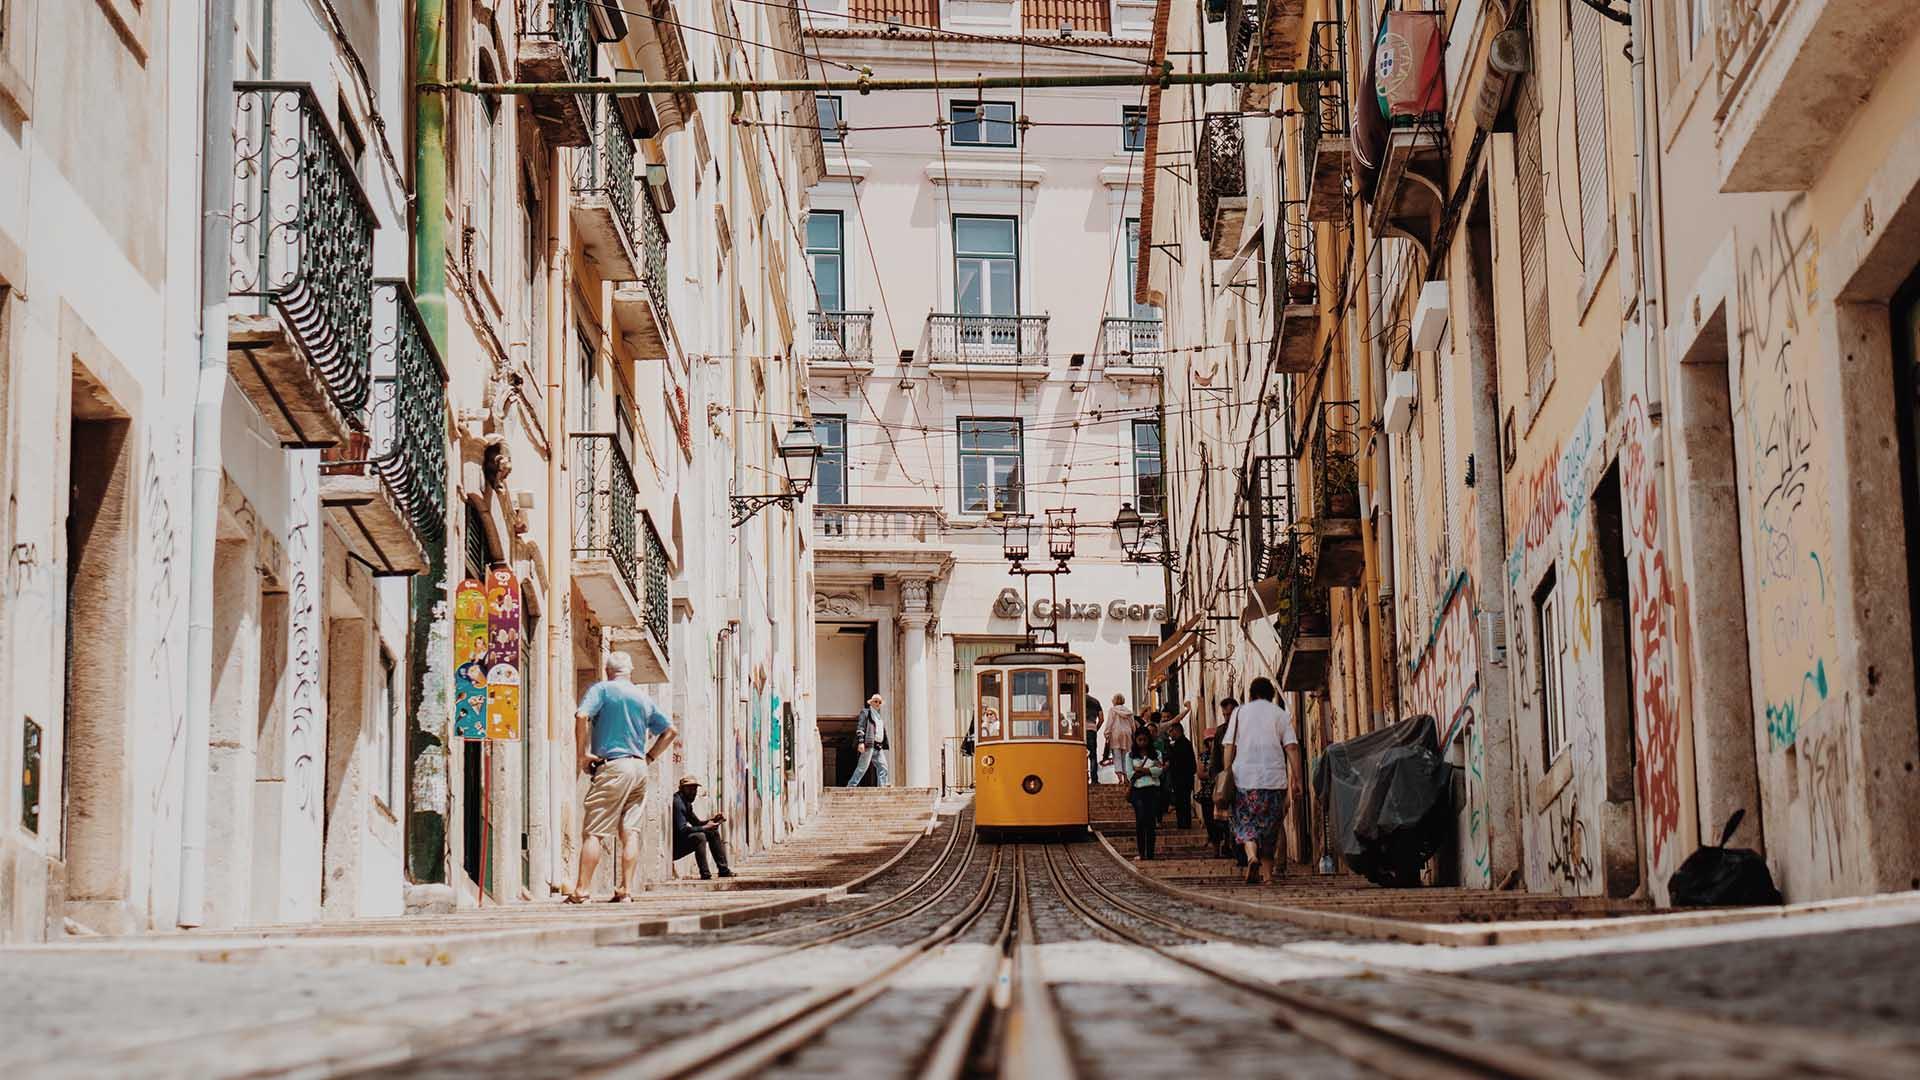 Getting lost in Lisbon